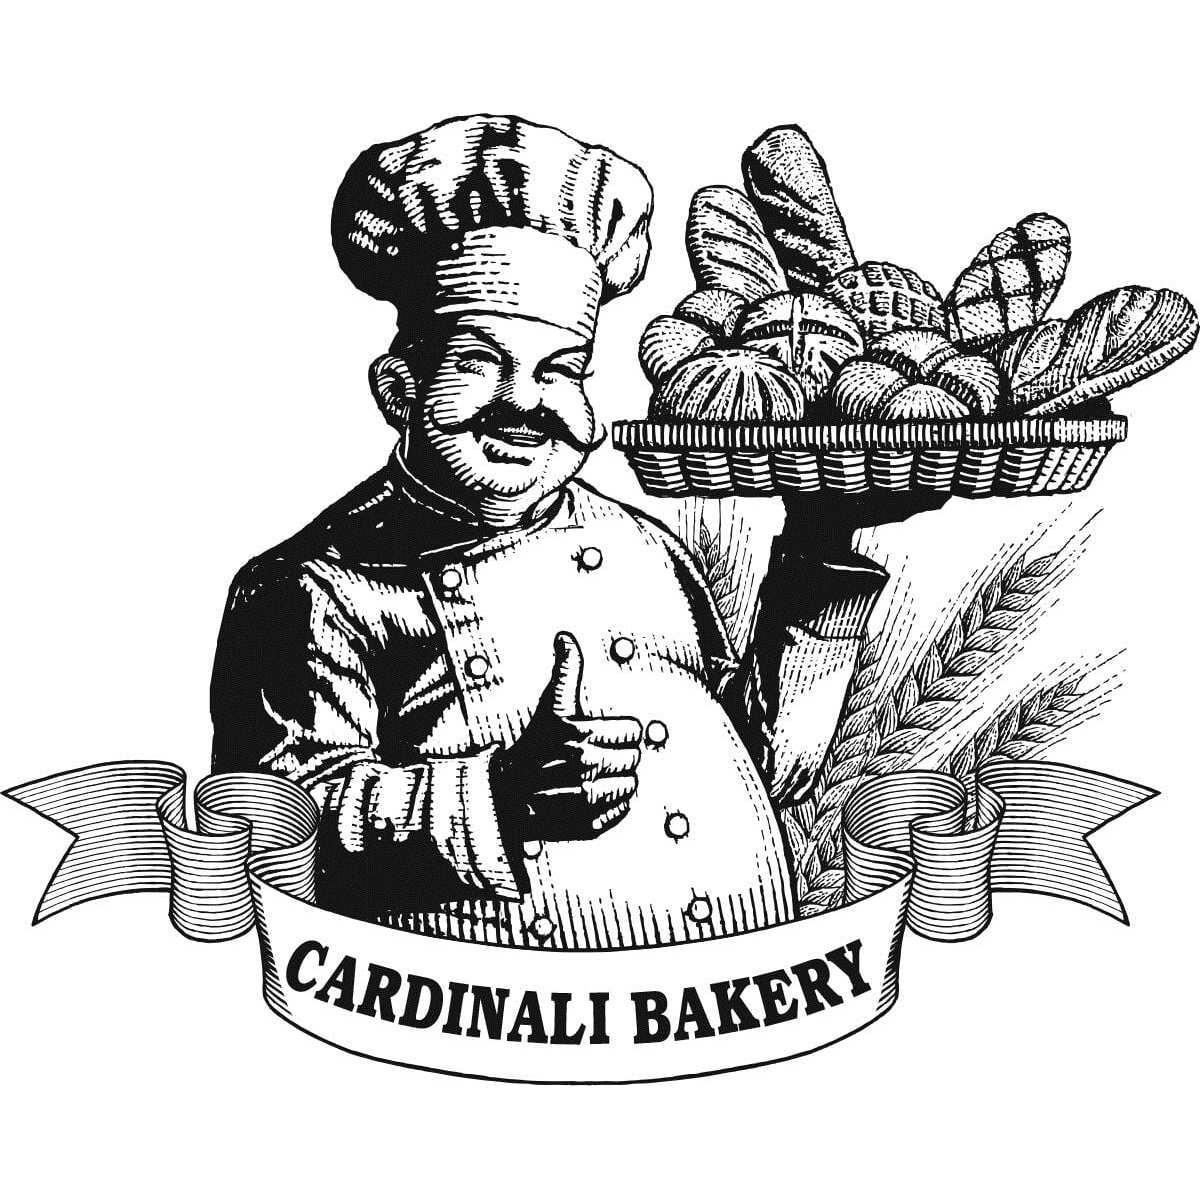 Cardinali Bakery